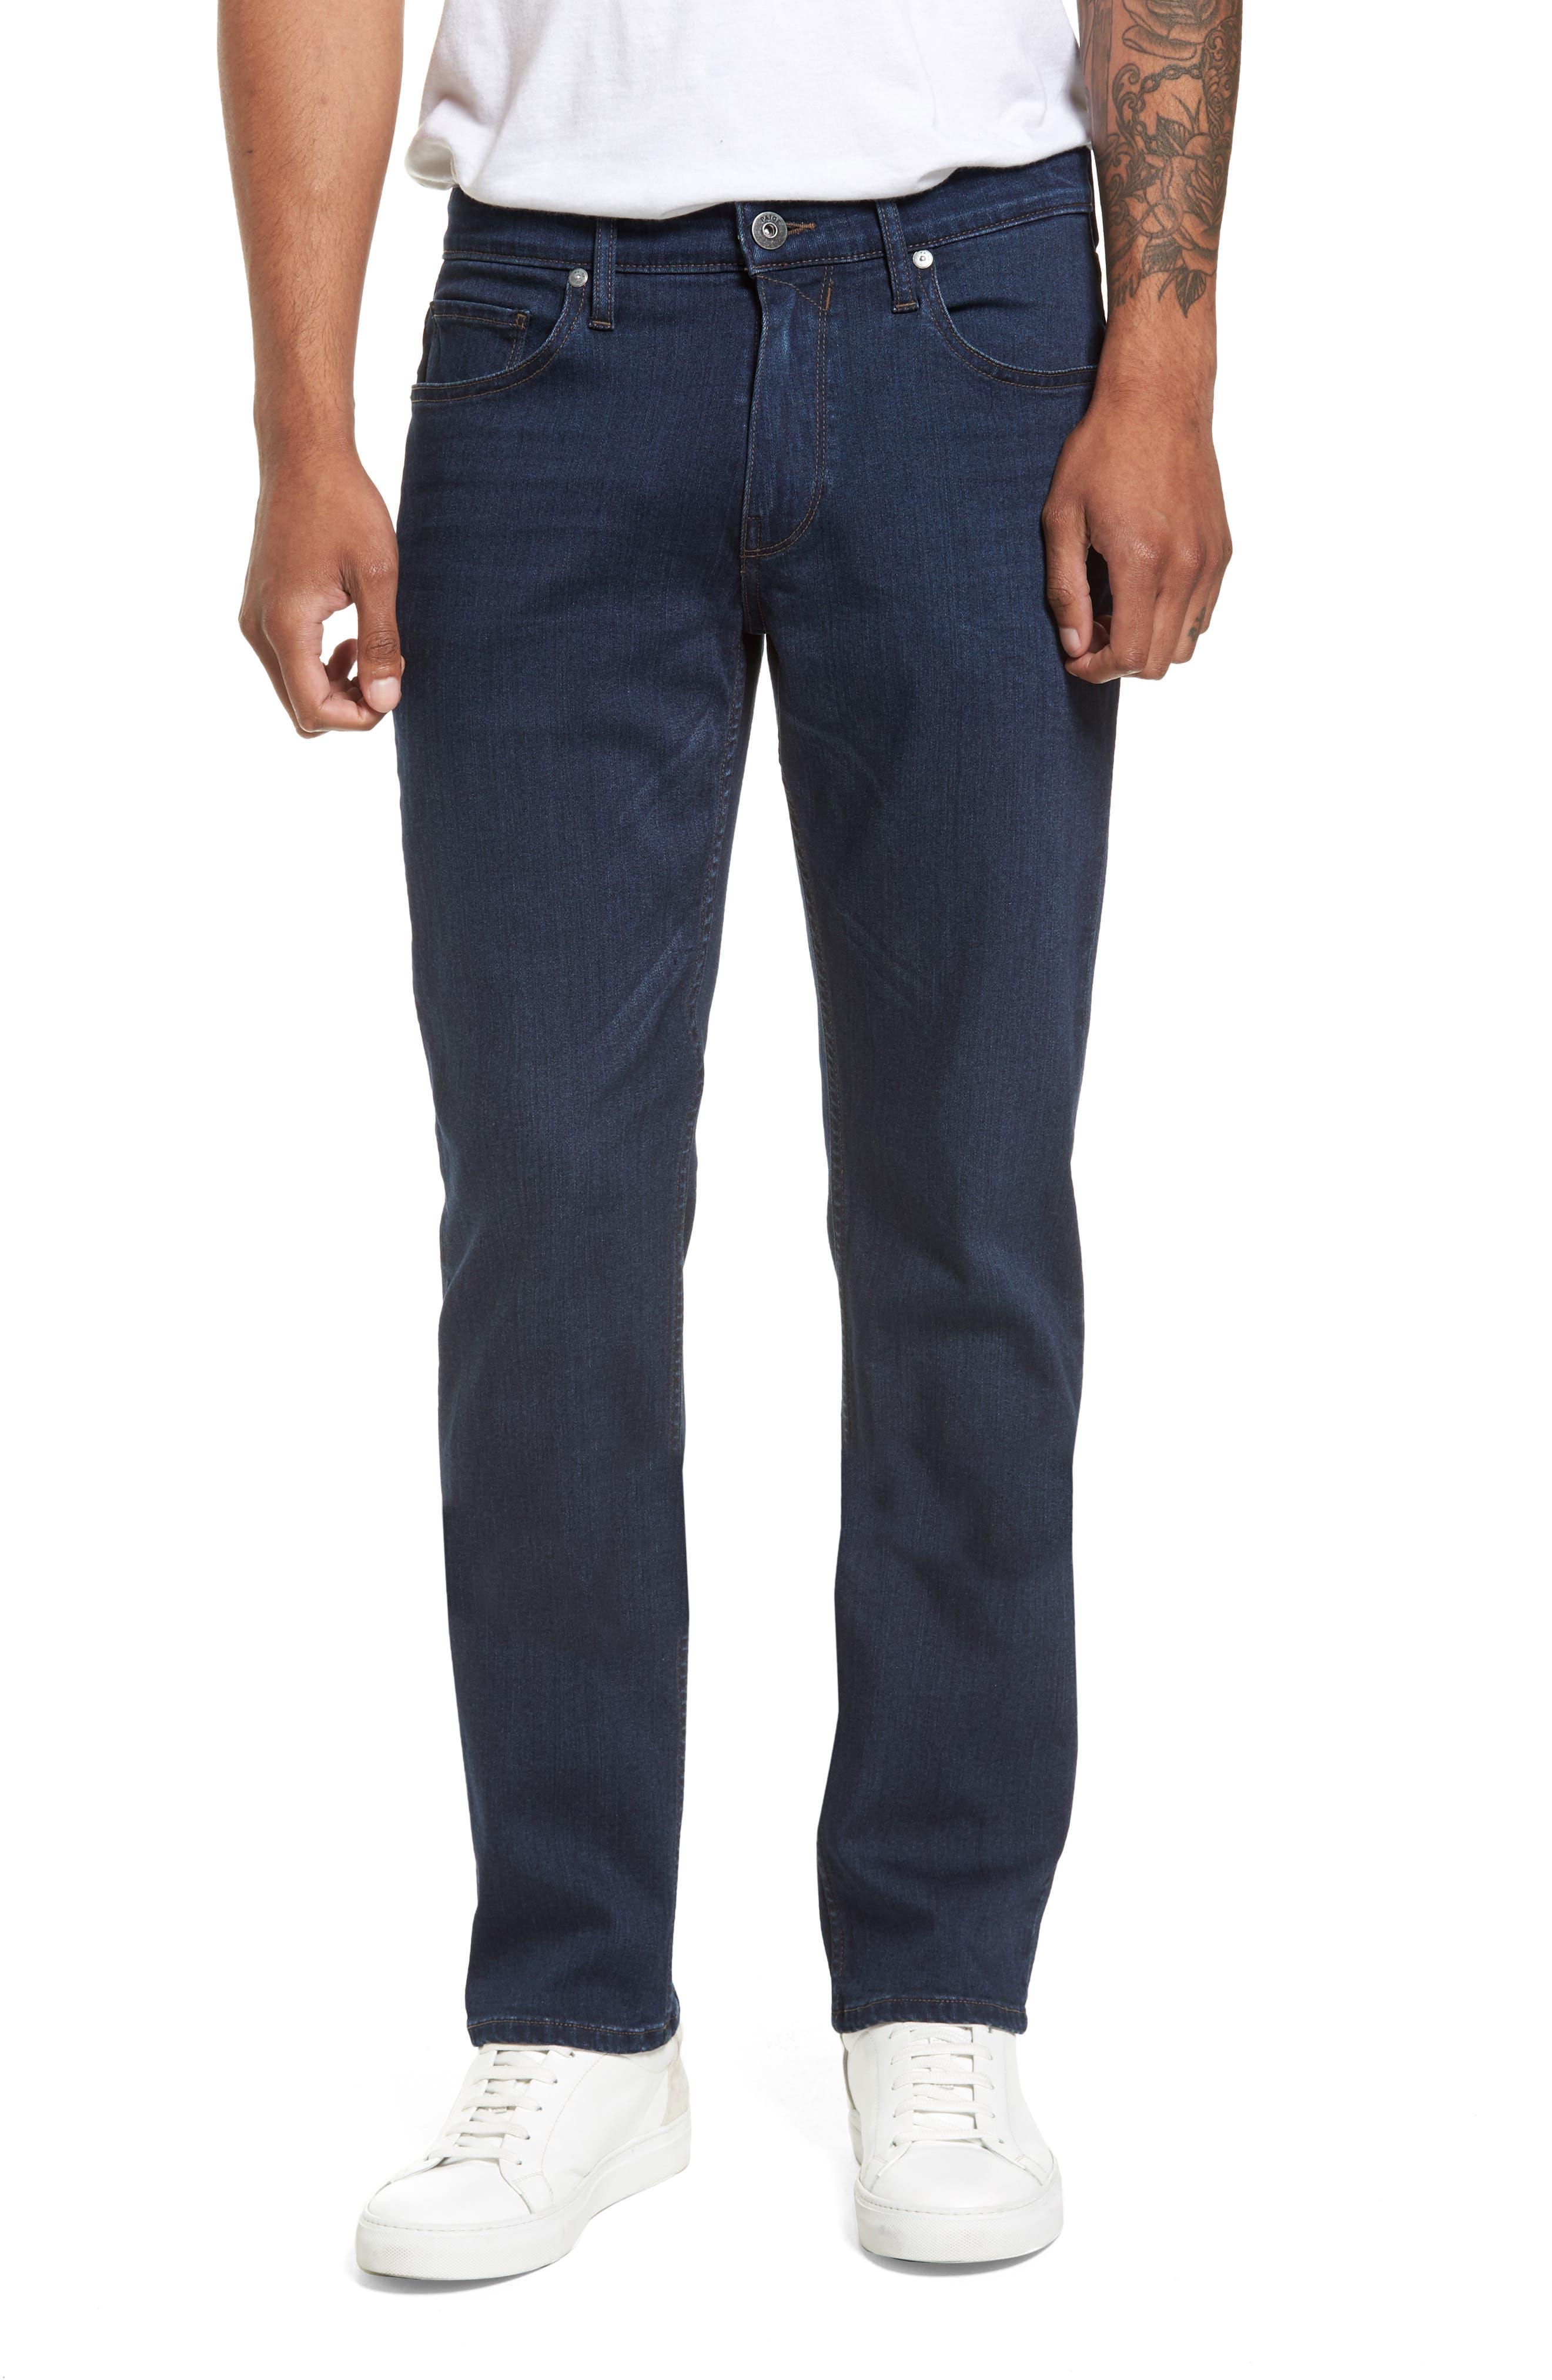 Normandie Straight Leg Jeans,                         Main,                         color,